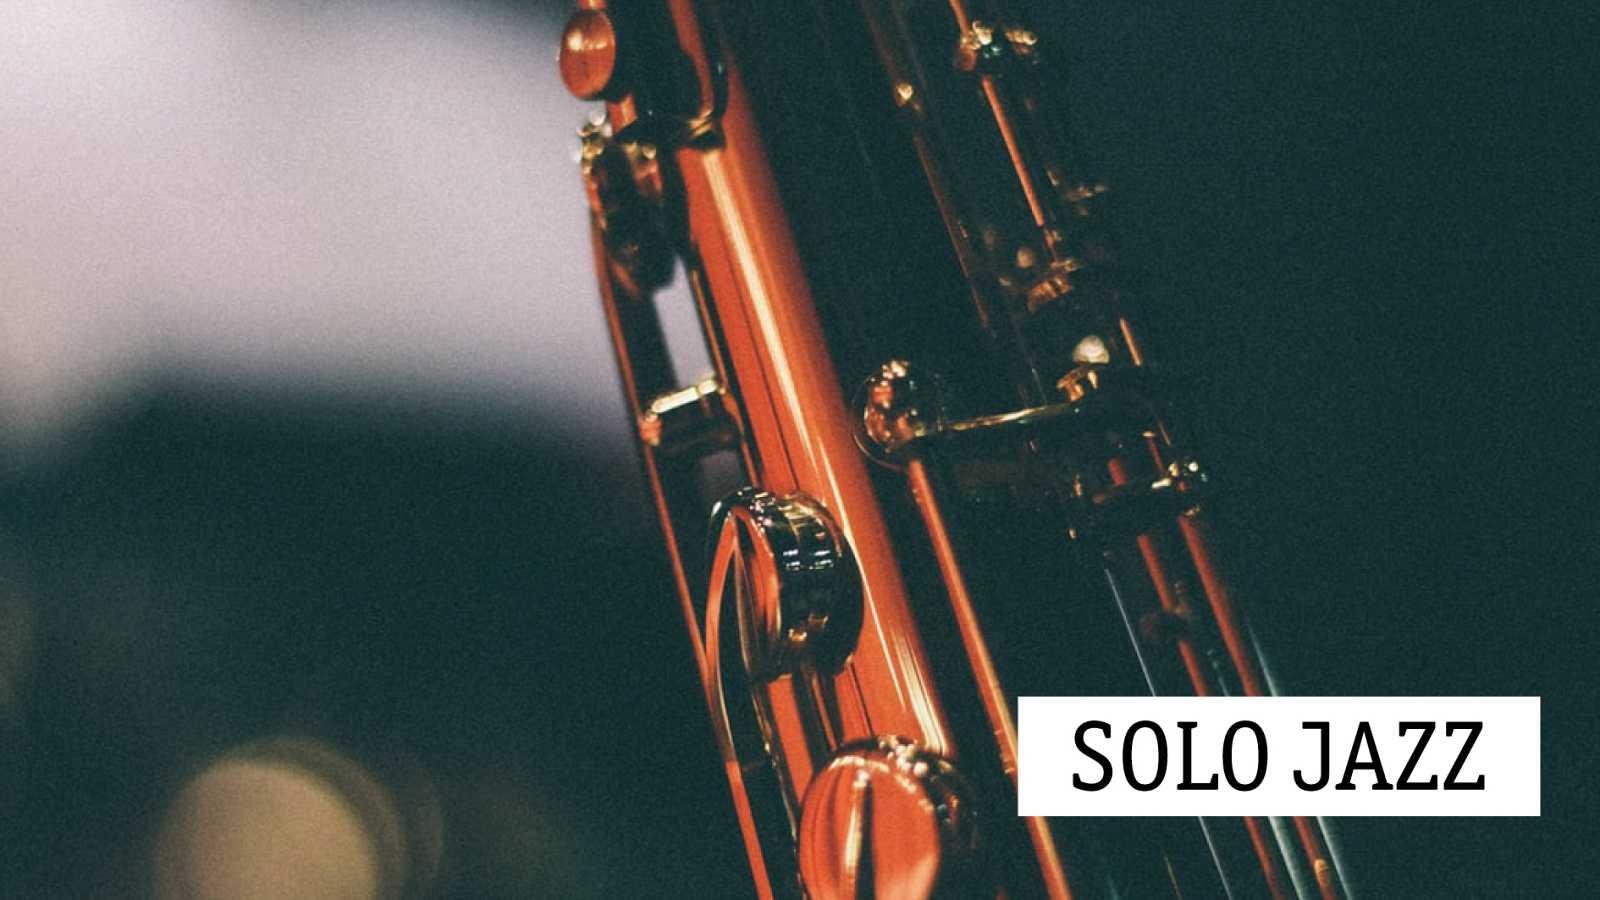 Solo jazz - Joe Zawinul colateral - 23/10/20 - escuchar ahora